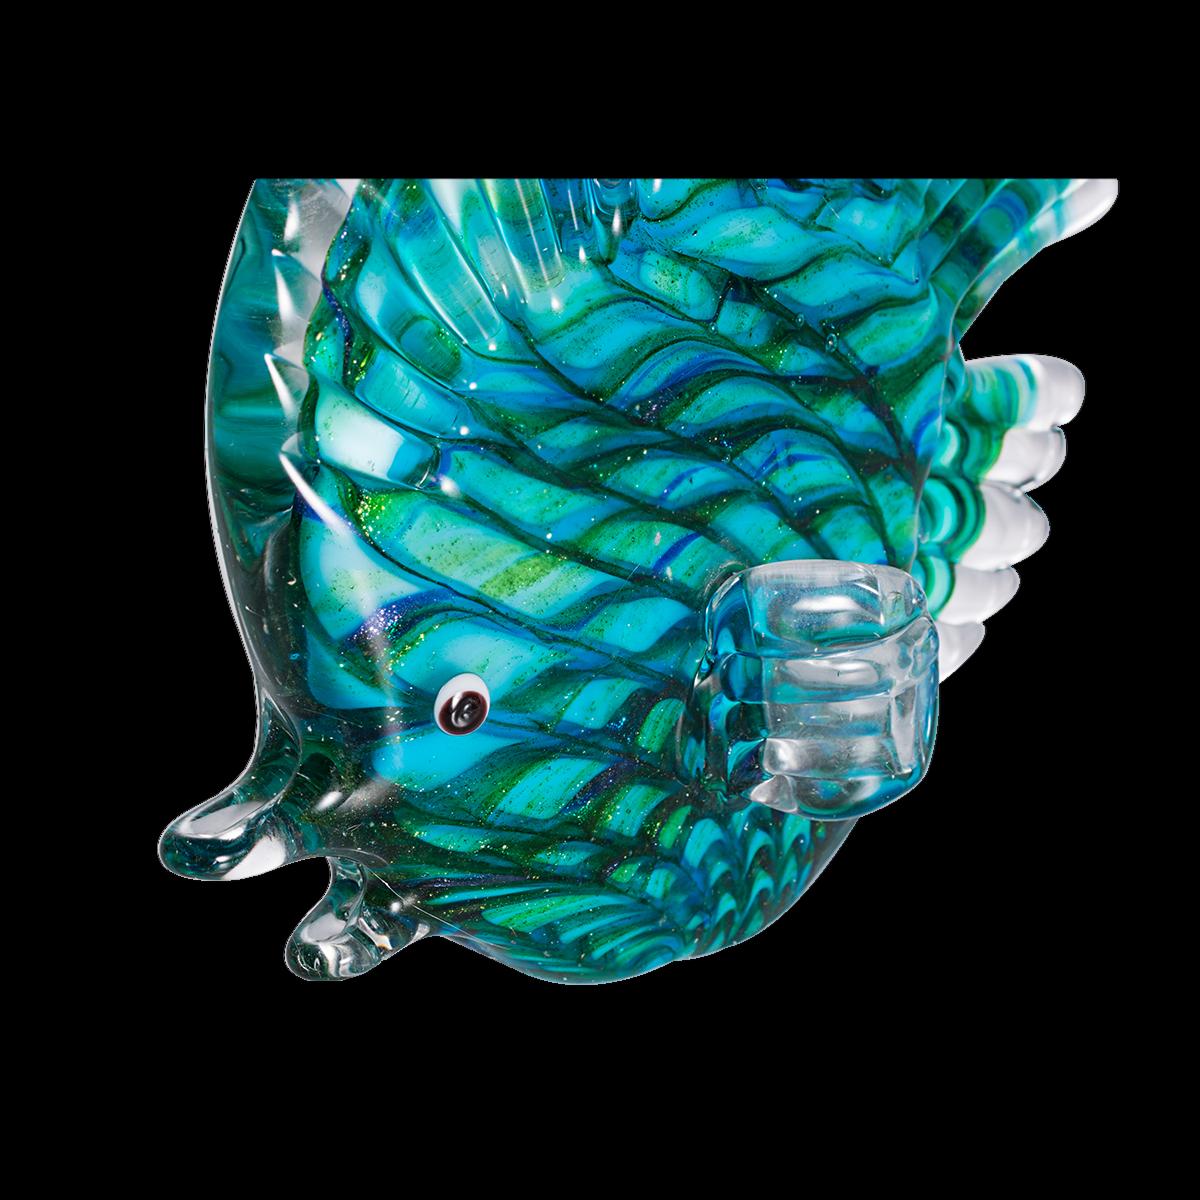 Crystal Stripe Tropical Fish Sculpture Art Glass Hand Blown Figurine Table Decor 2